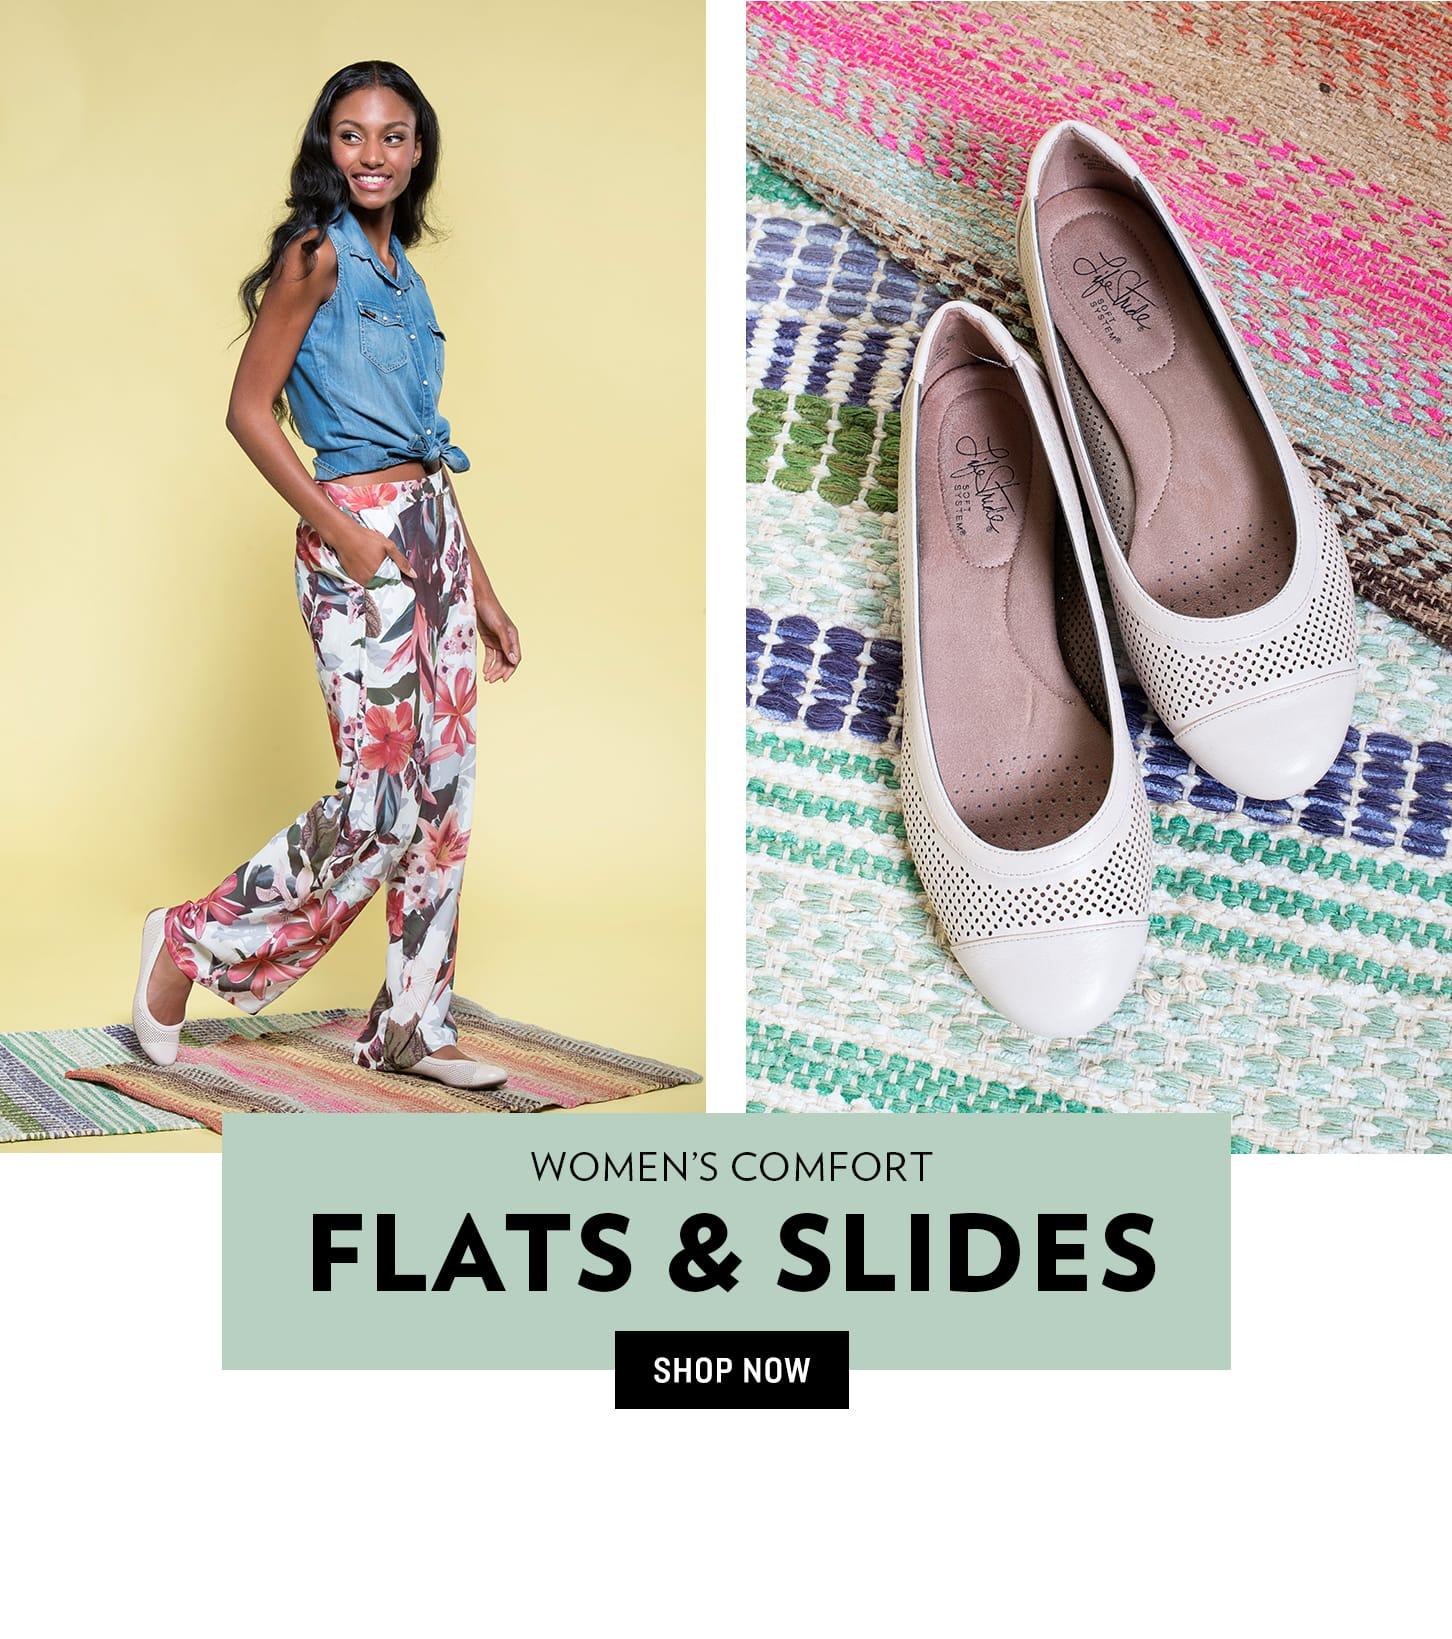 Shop Women's Comfort Flats & Slides